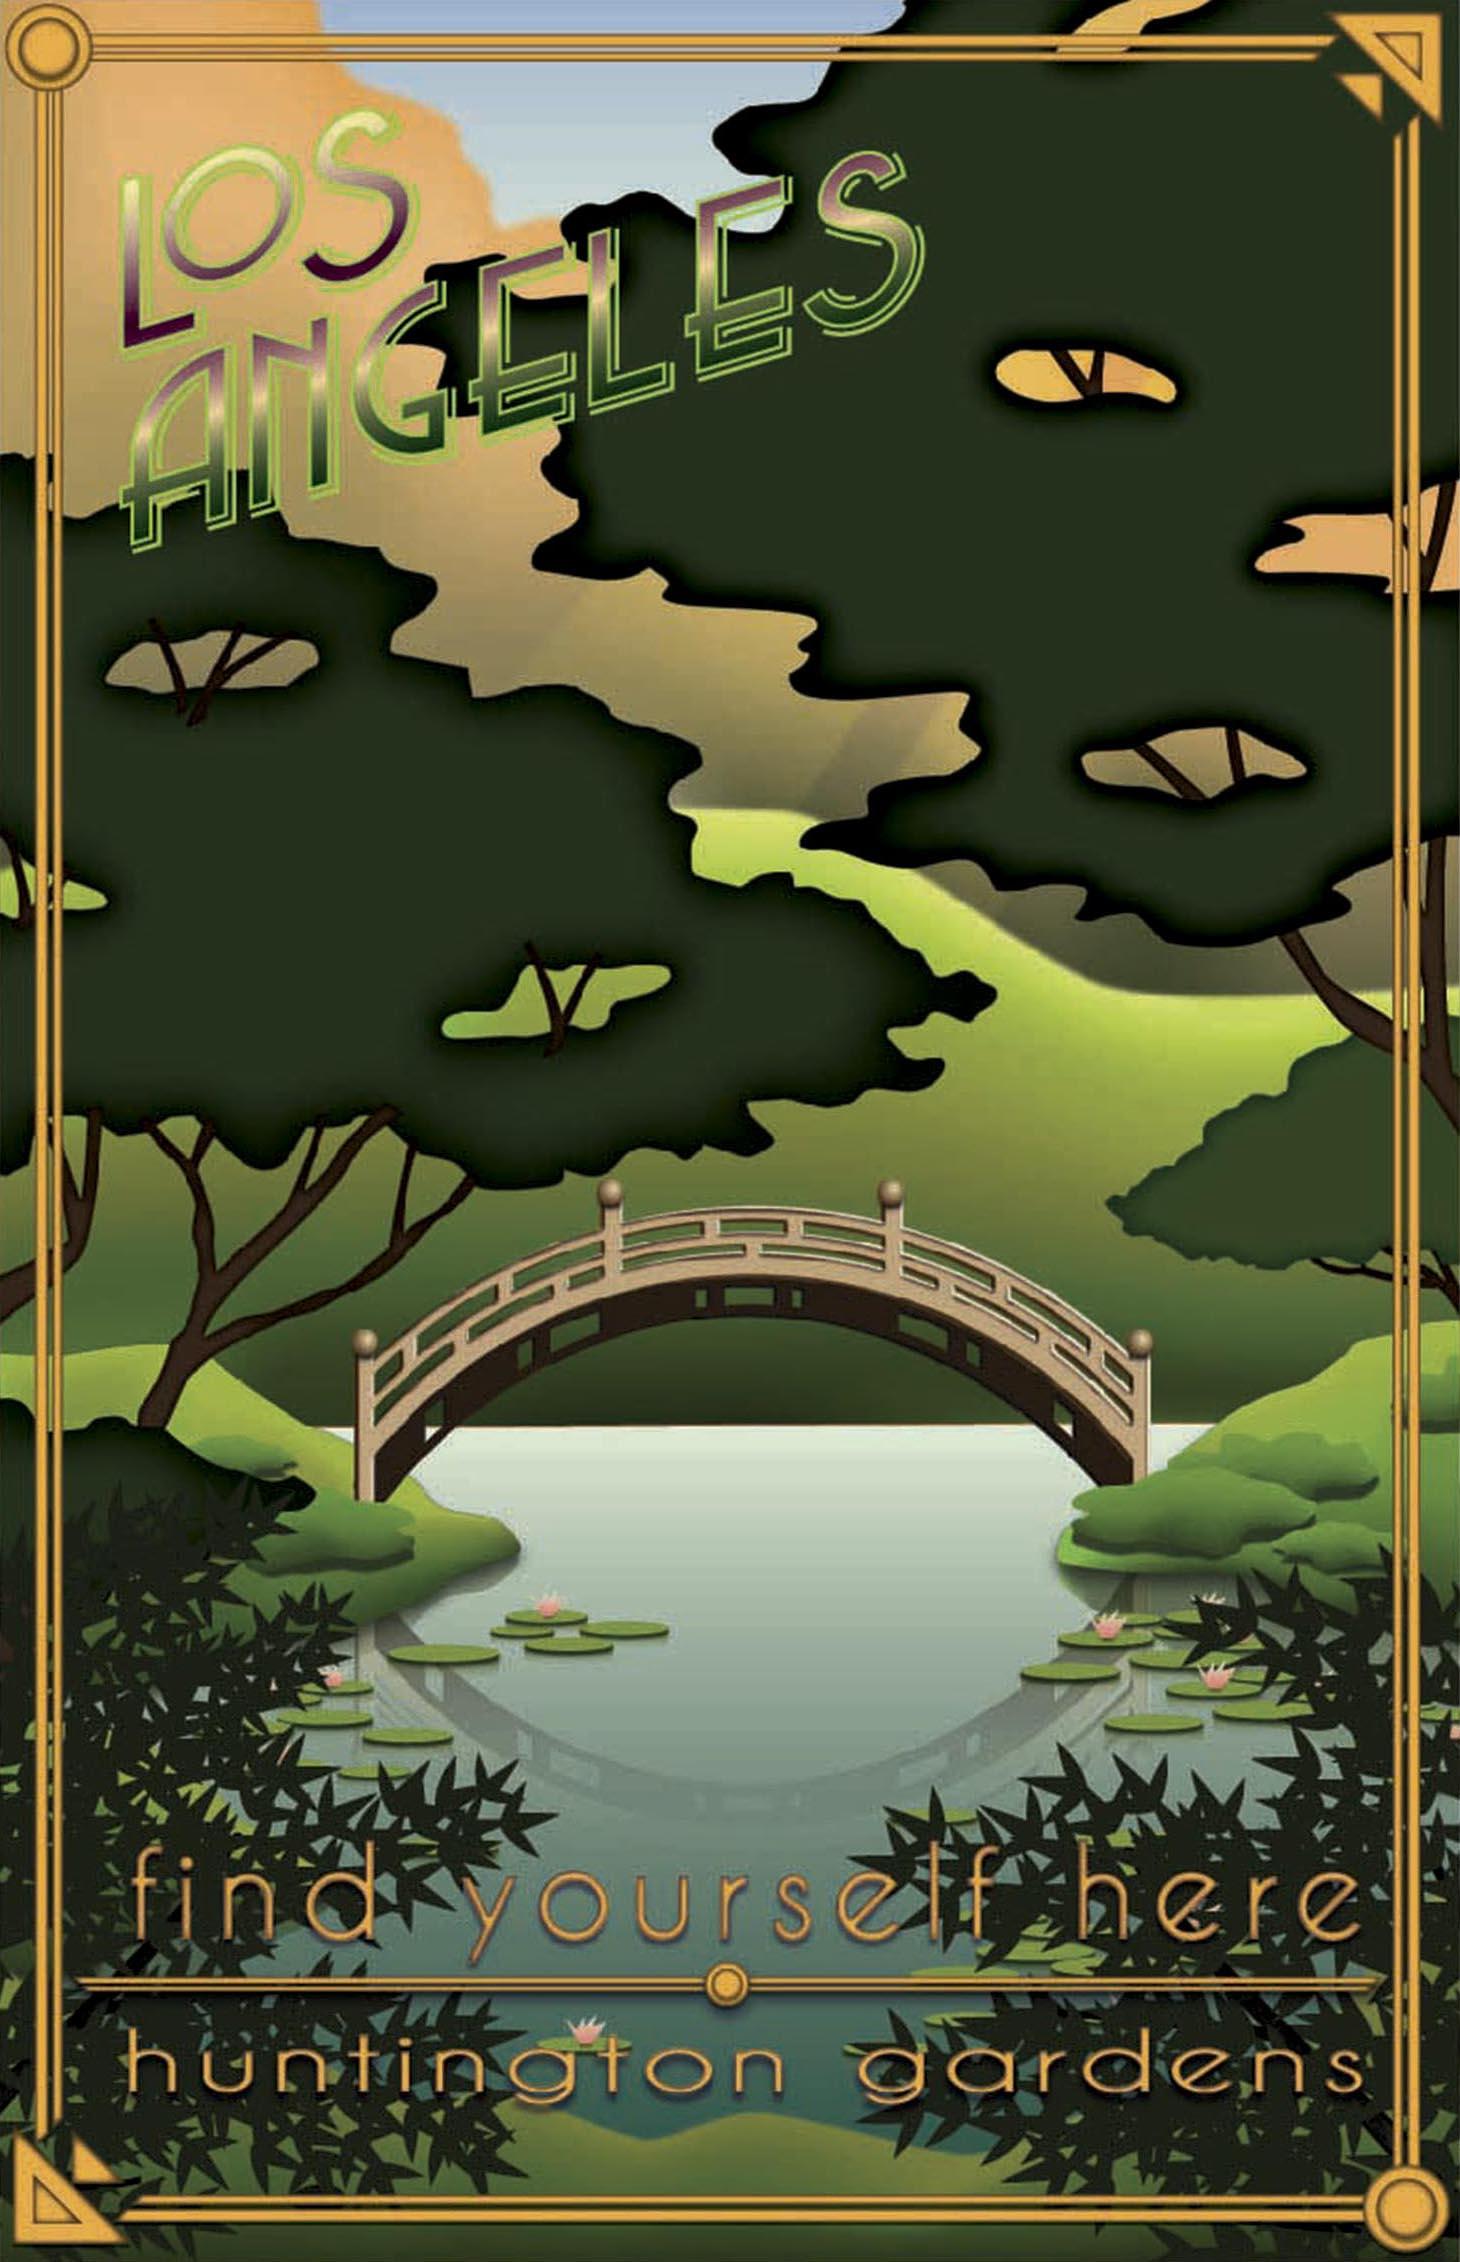 Poster Huntington Gardens.jpg